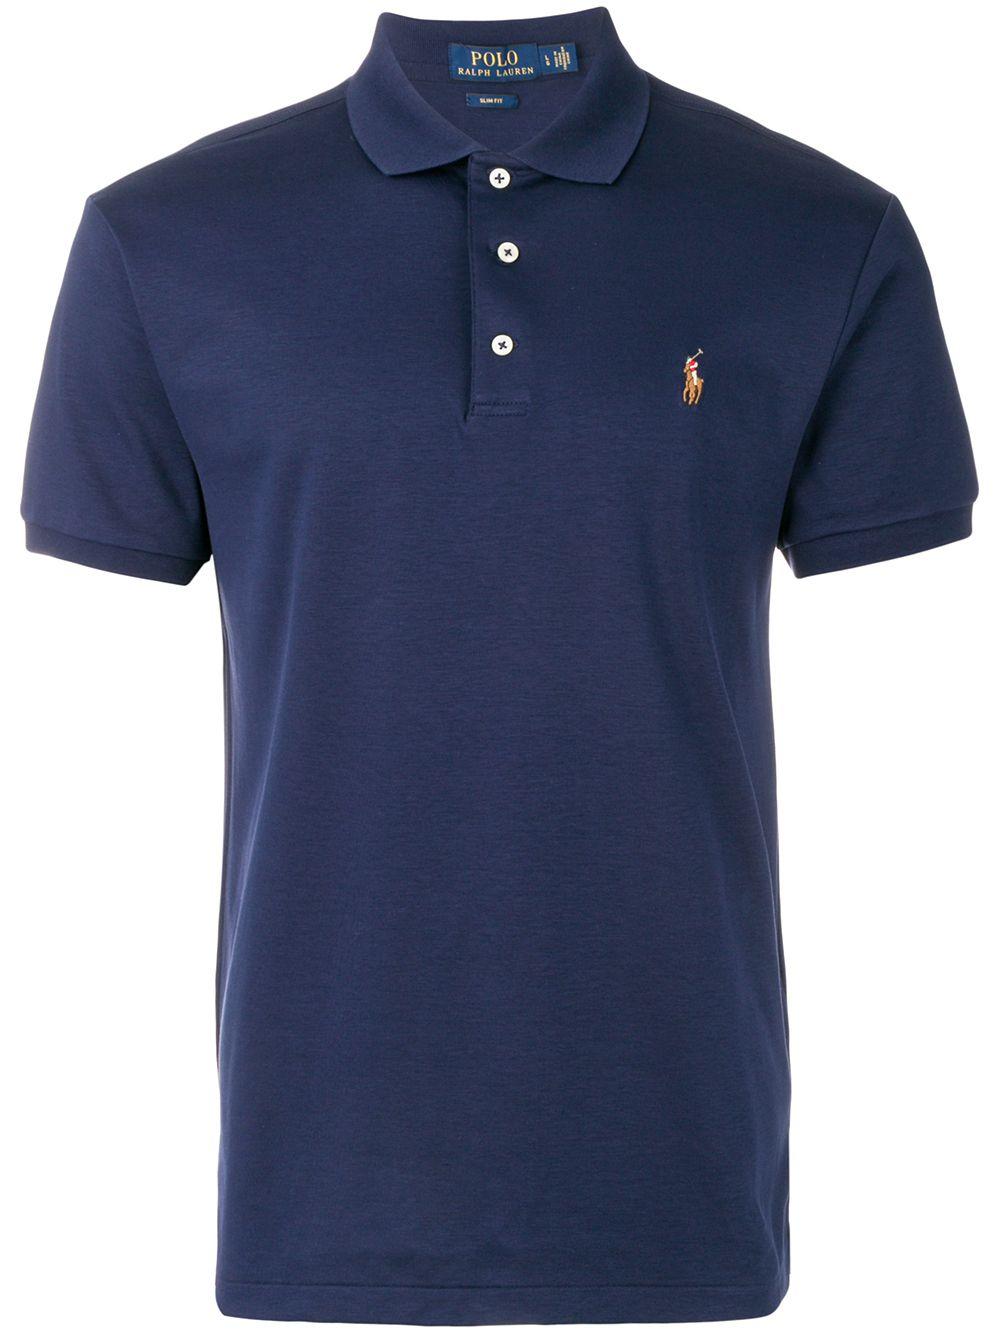 Polo Ralph Lauren Poloshirt mit Stickerei - Blau